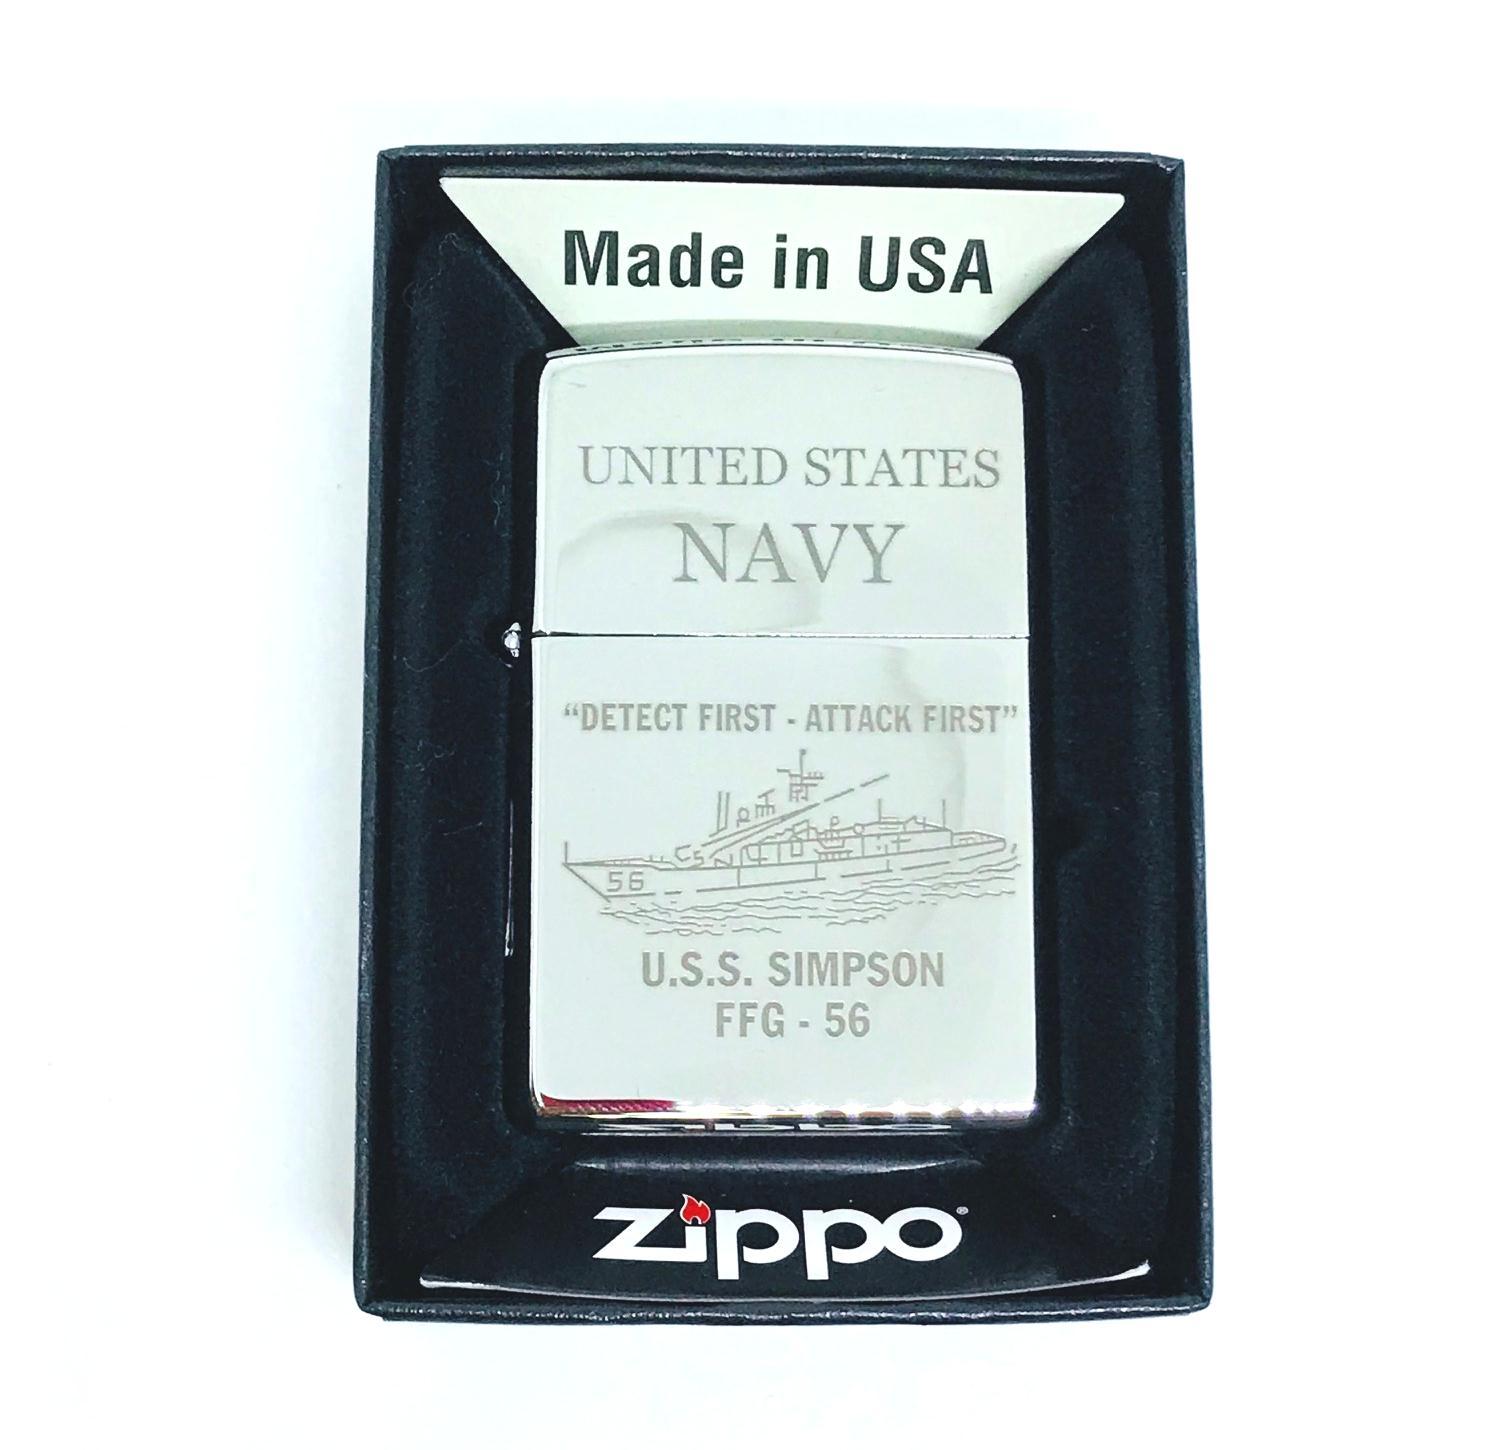 Hop quet zippo bong trang khac laze UNITED STATES NAVY Z605